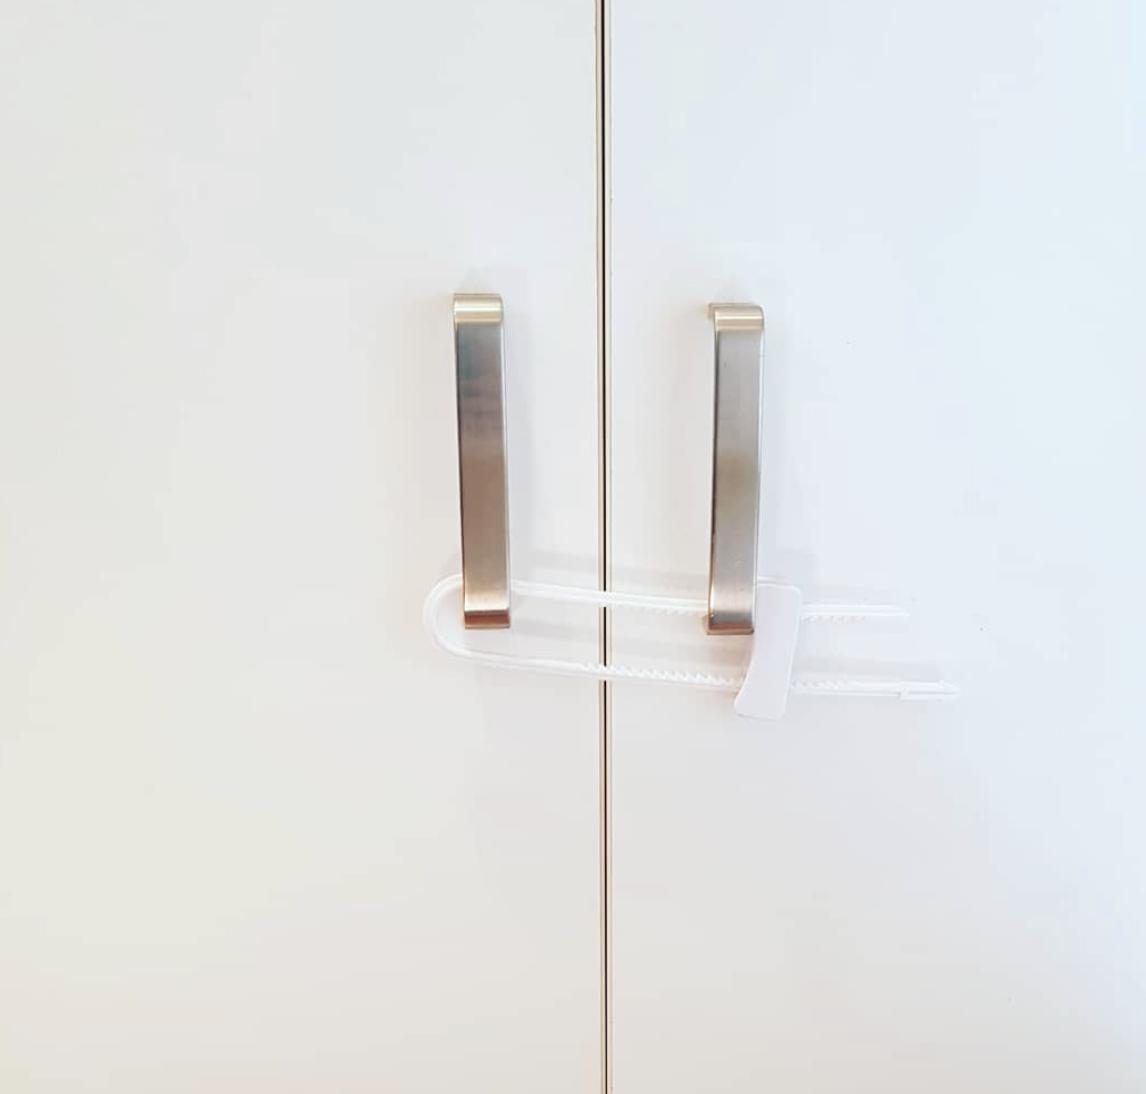 Sliding Cabinet Lock